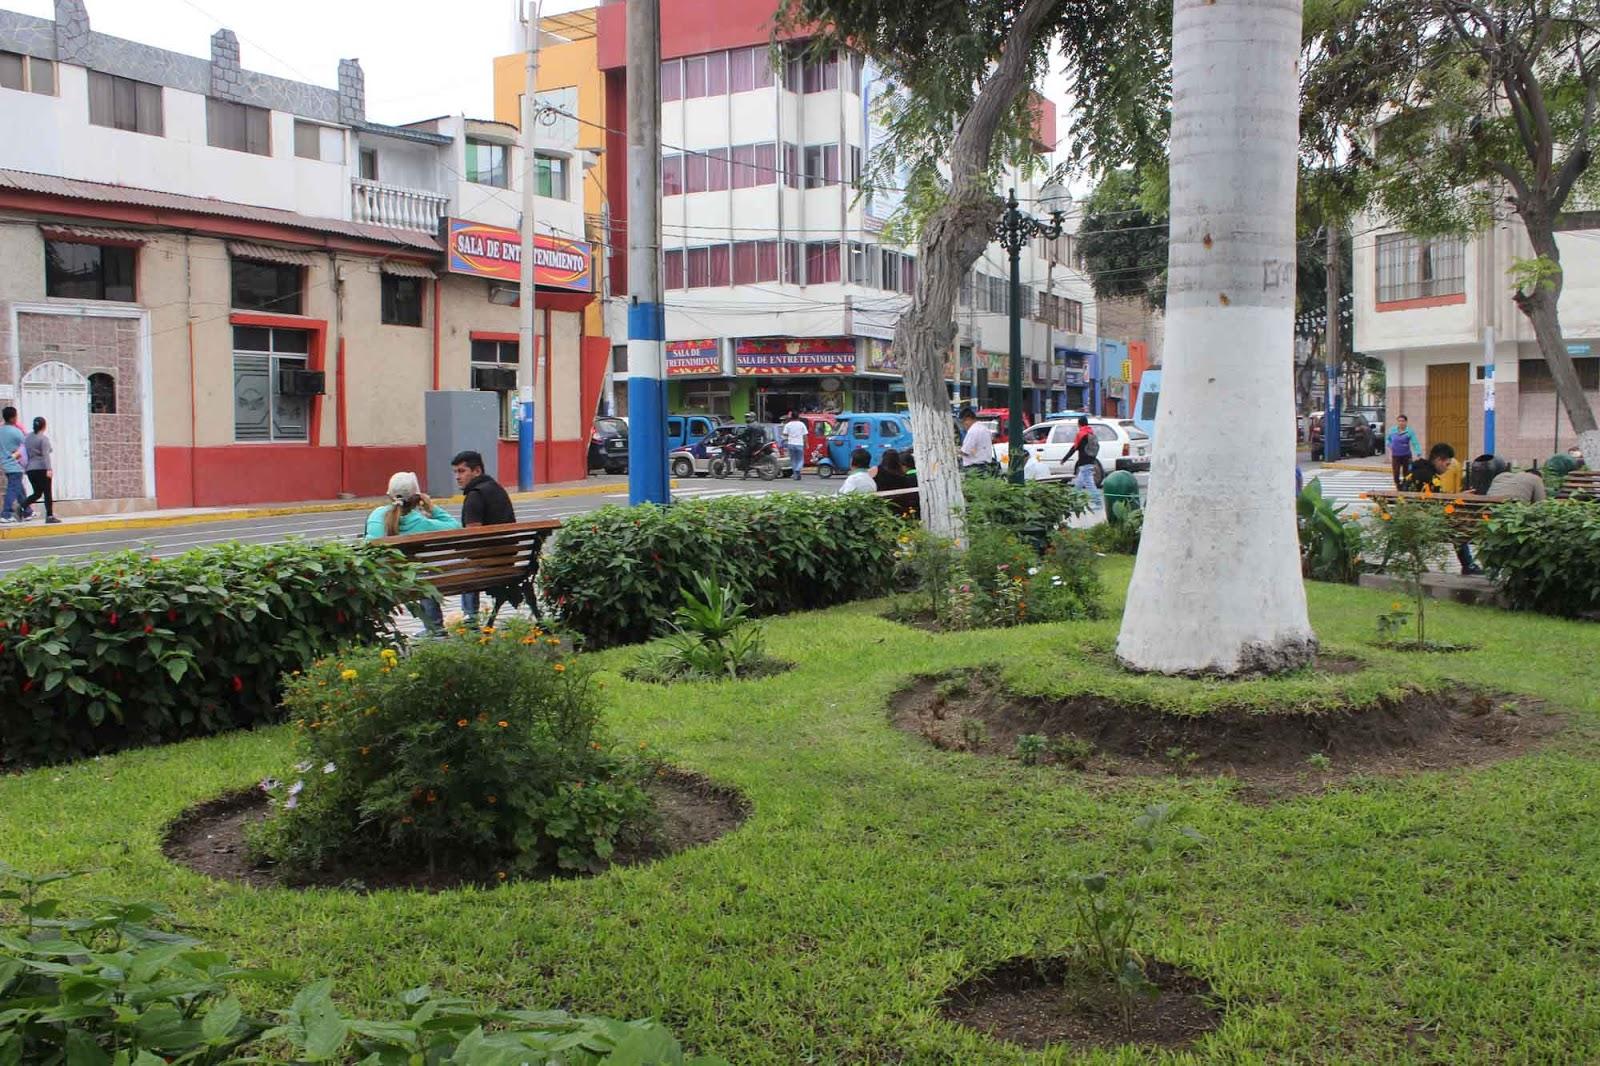 Huacho informa remodelan jardines de la plaza mayor de huacho for Jardines de plaza